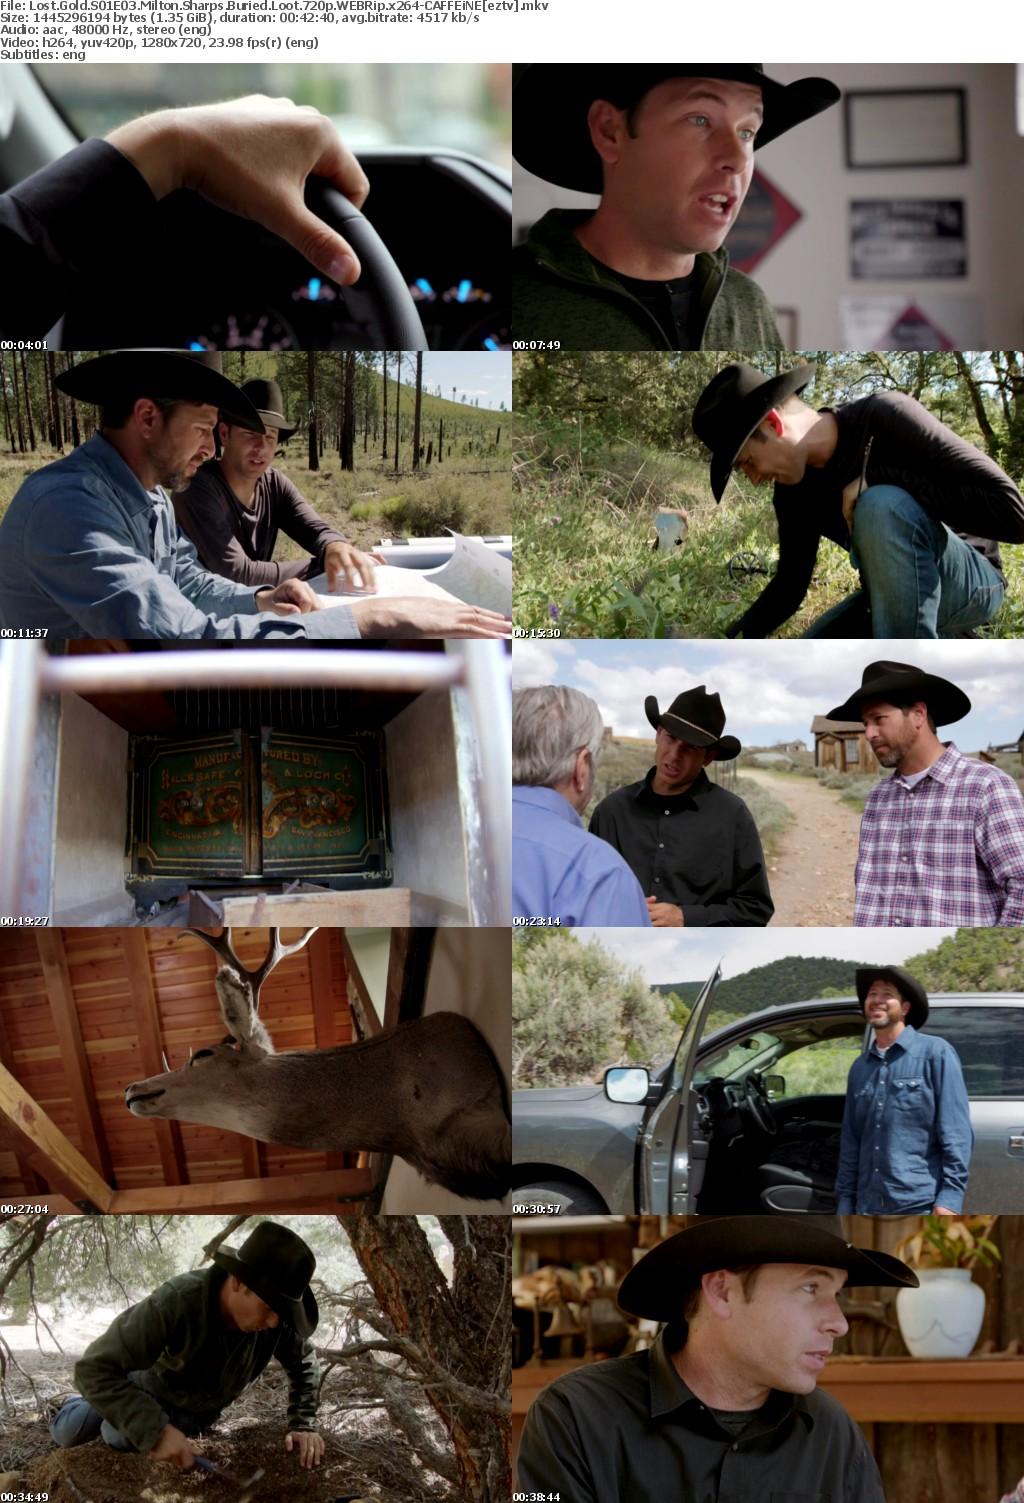 Lost Gold S01E03 Milton Sharps Buried Loot 720p WEBRip x264-CAFFEiNE